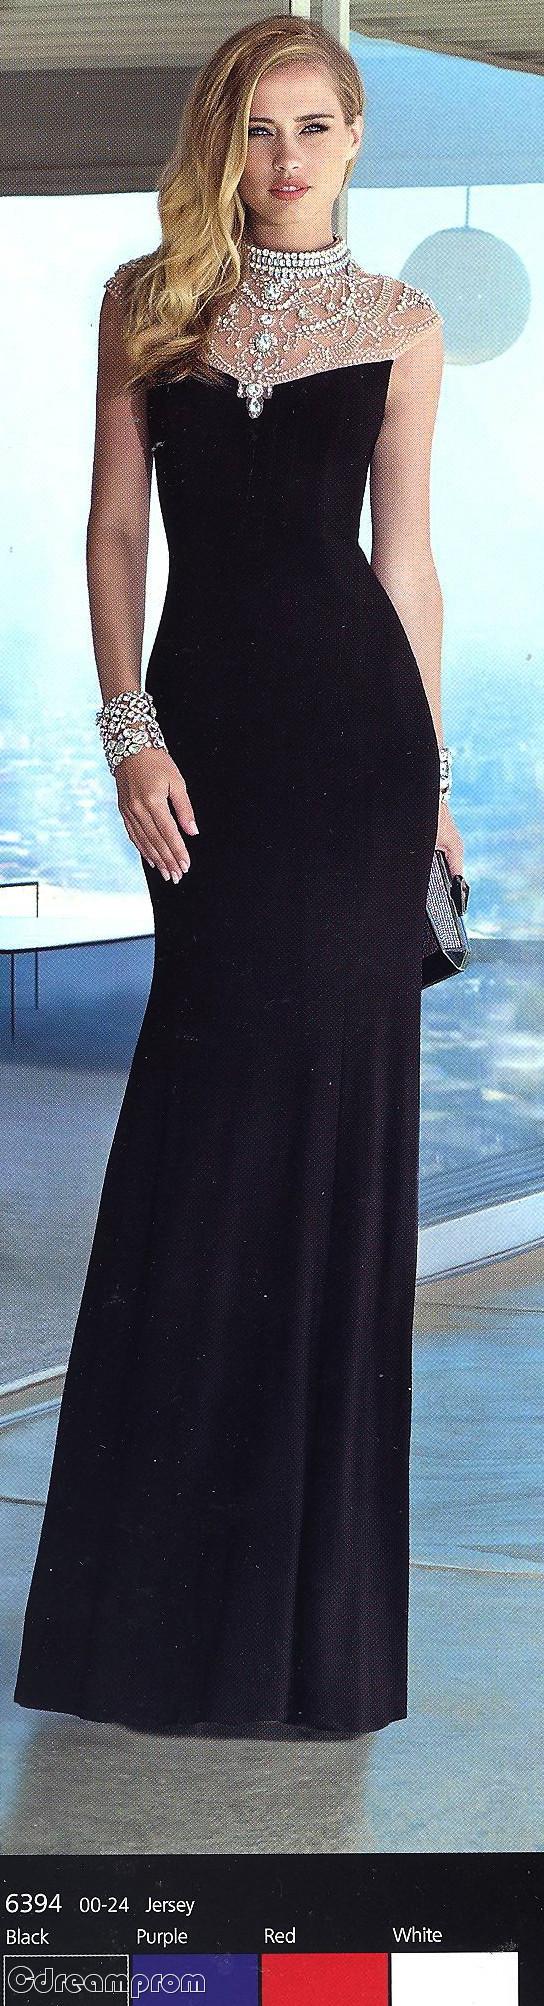 Elegant prom dress prom gown mode pinterest dress prom prom